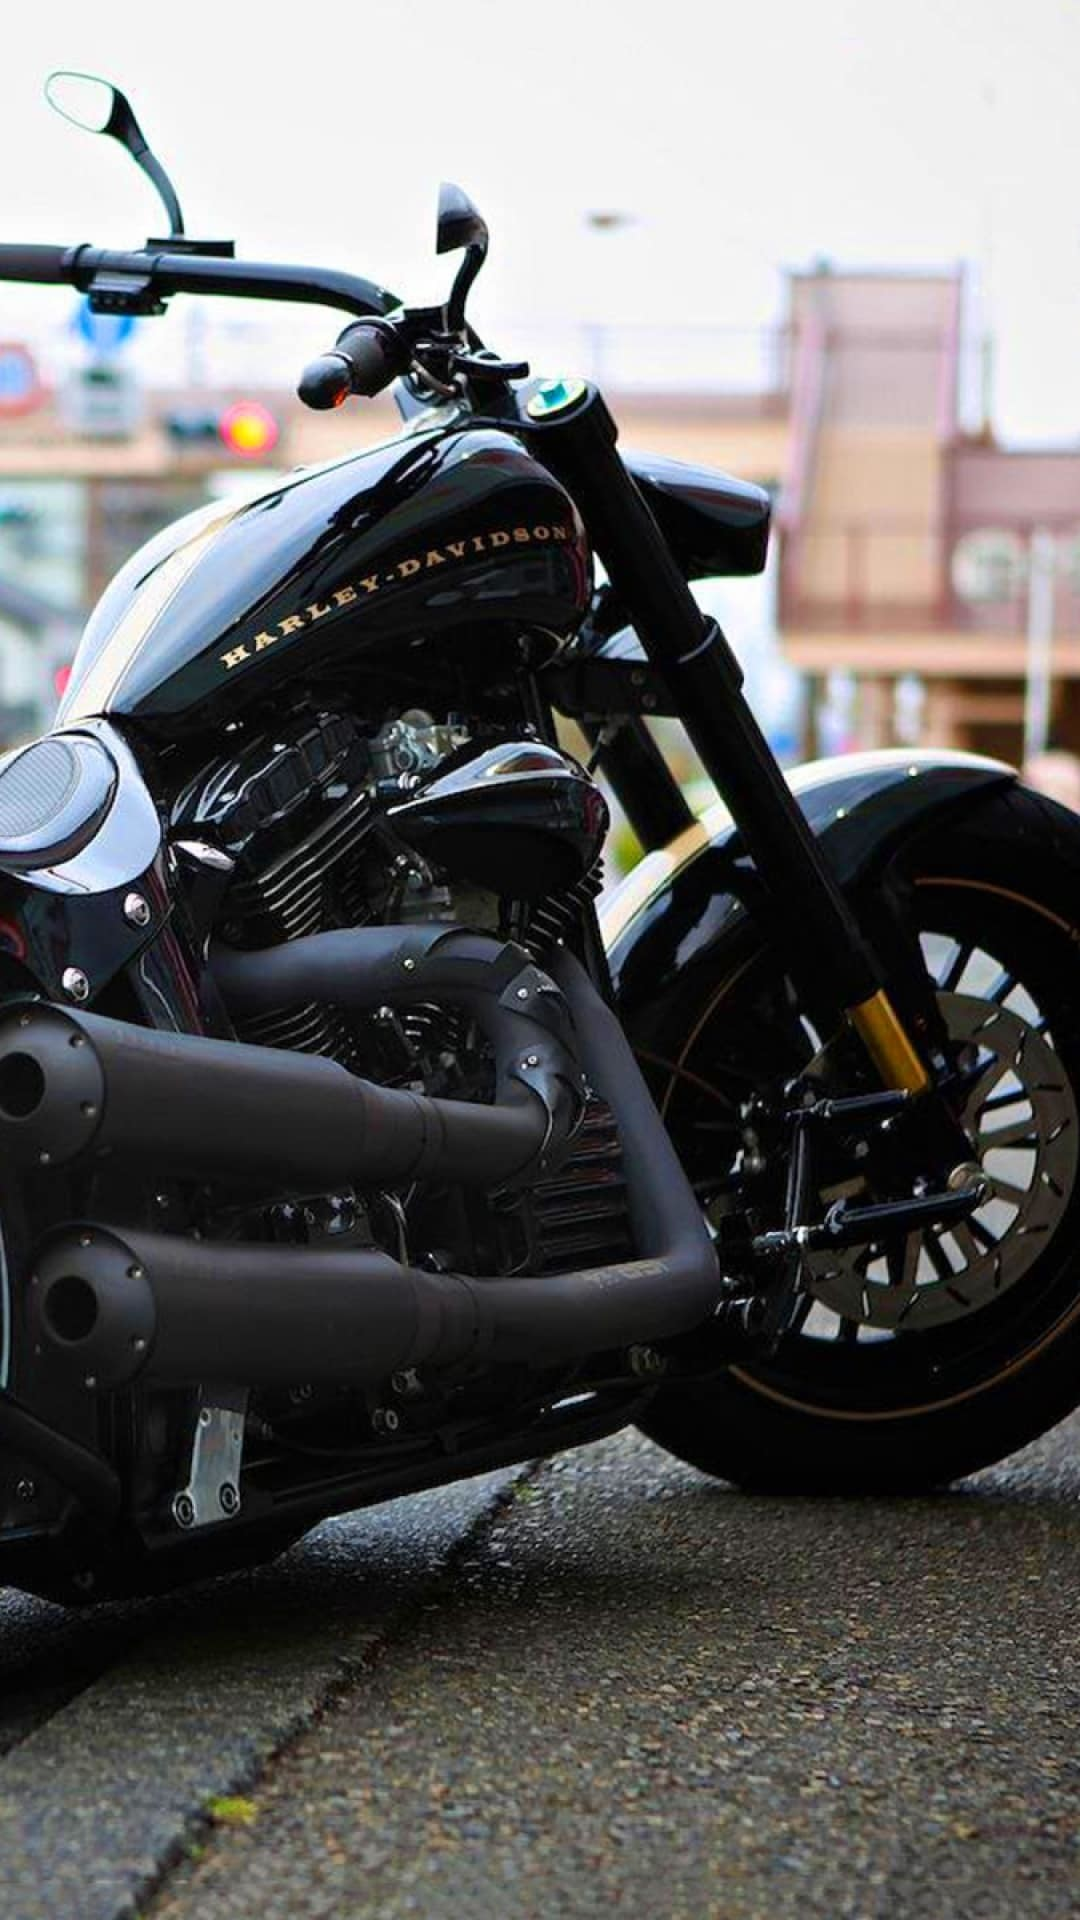 Harley Davidson Wallpapers And Screensavers 80 Images